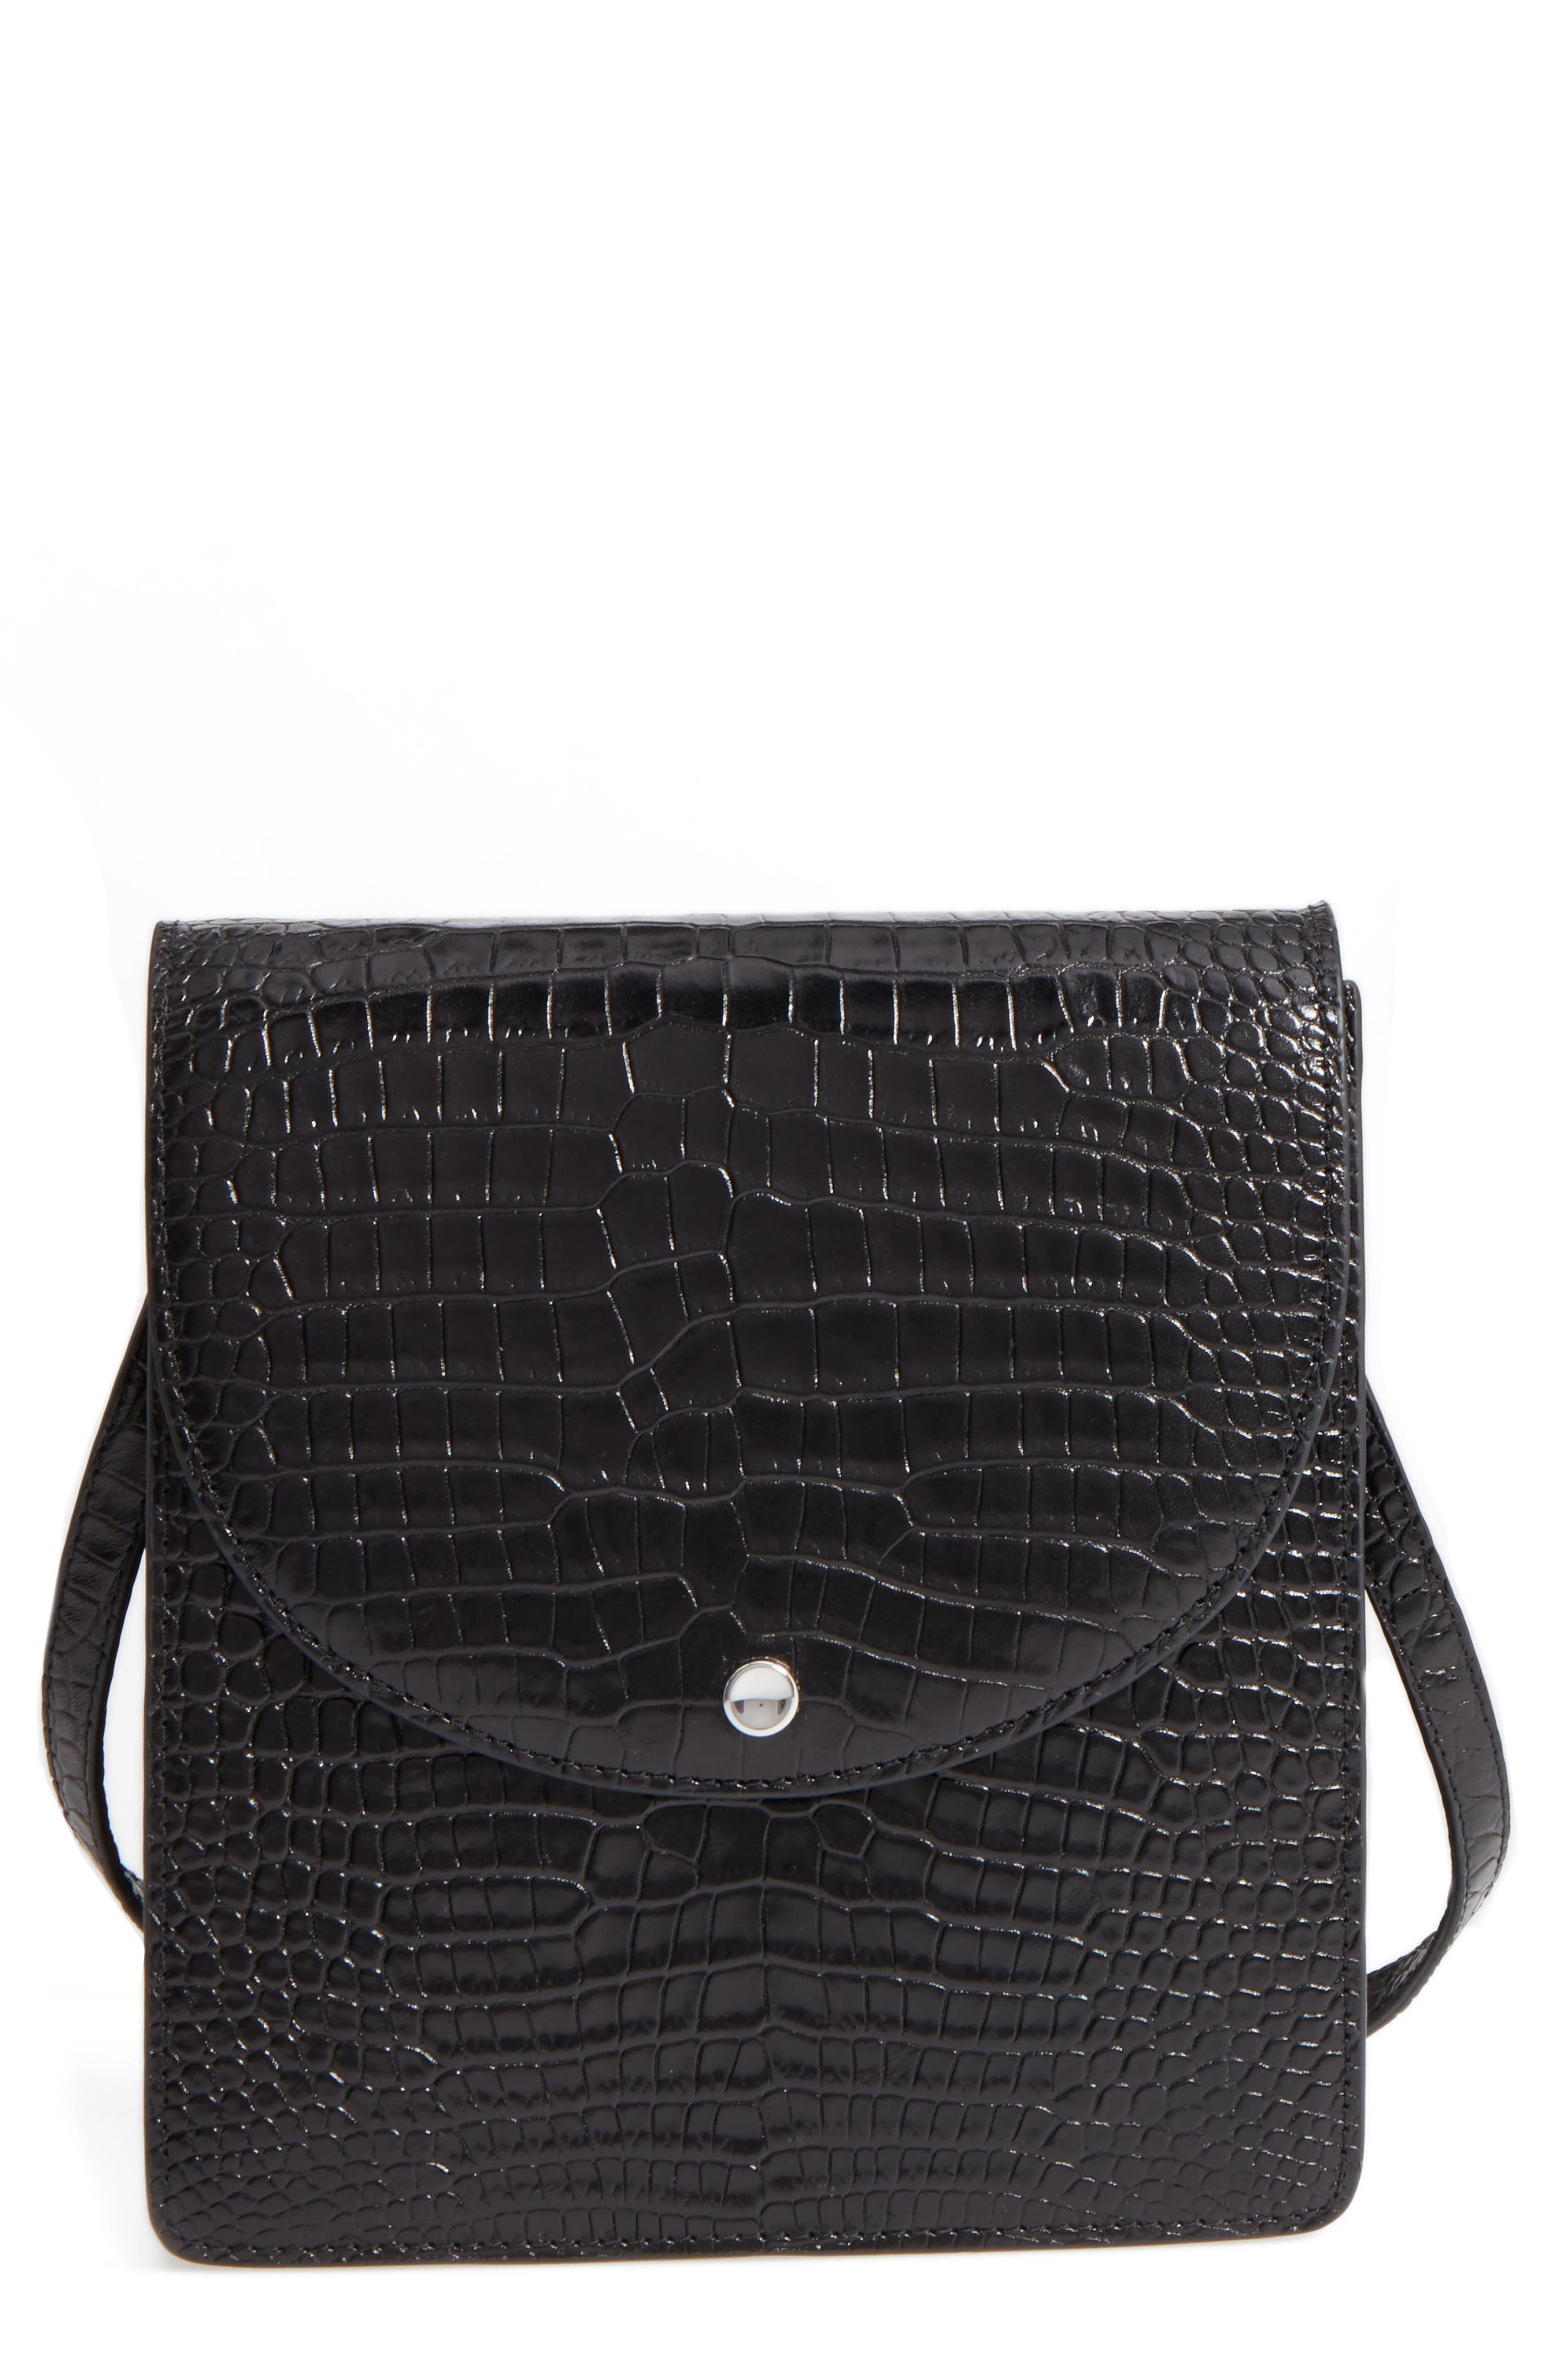 Eloise Leather Crossbody Bag,                             Main thumbnail 1, color,                             Black